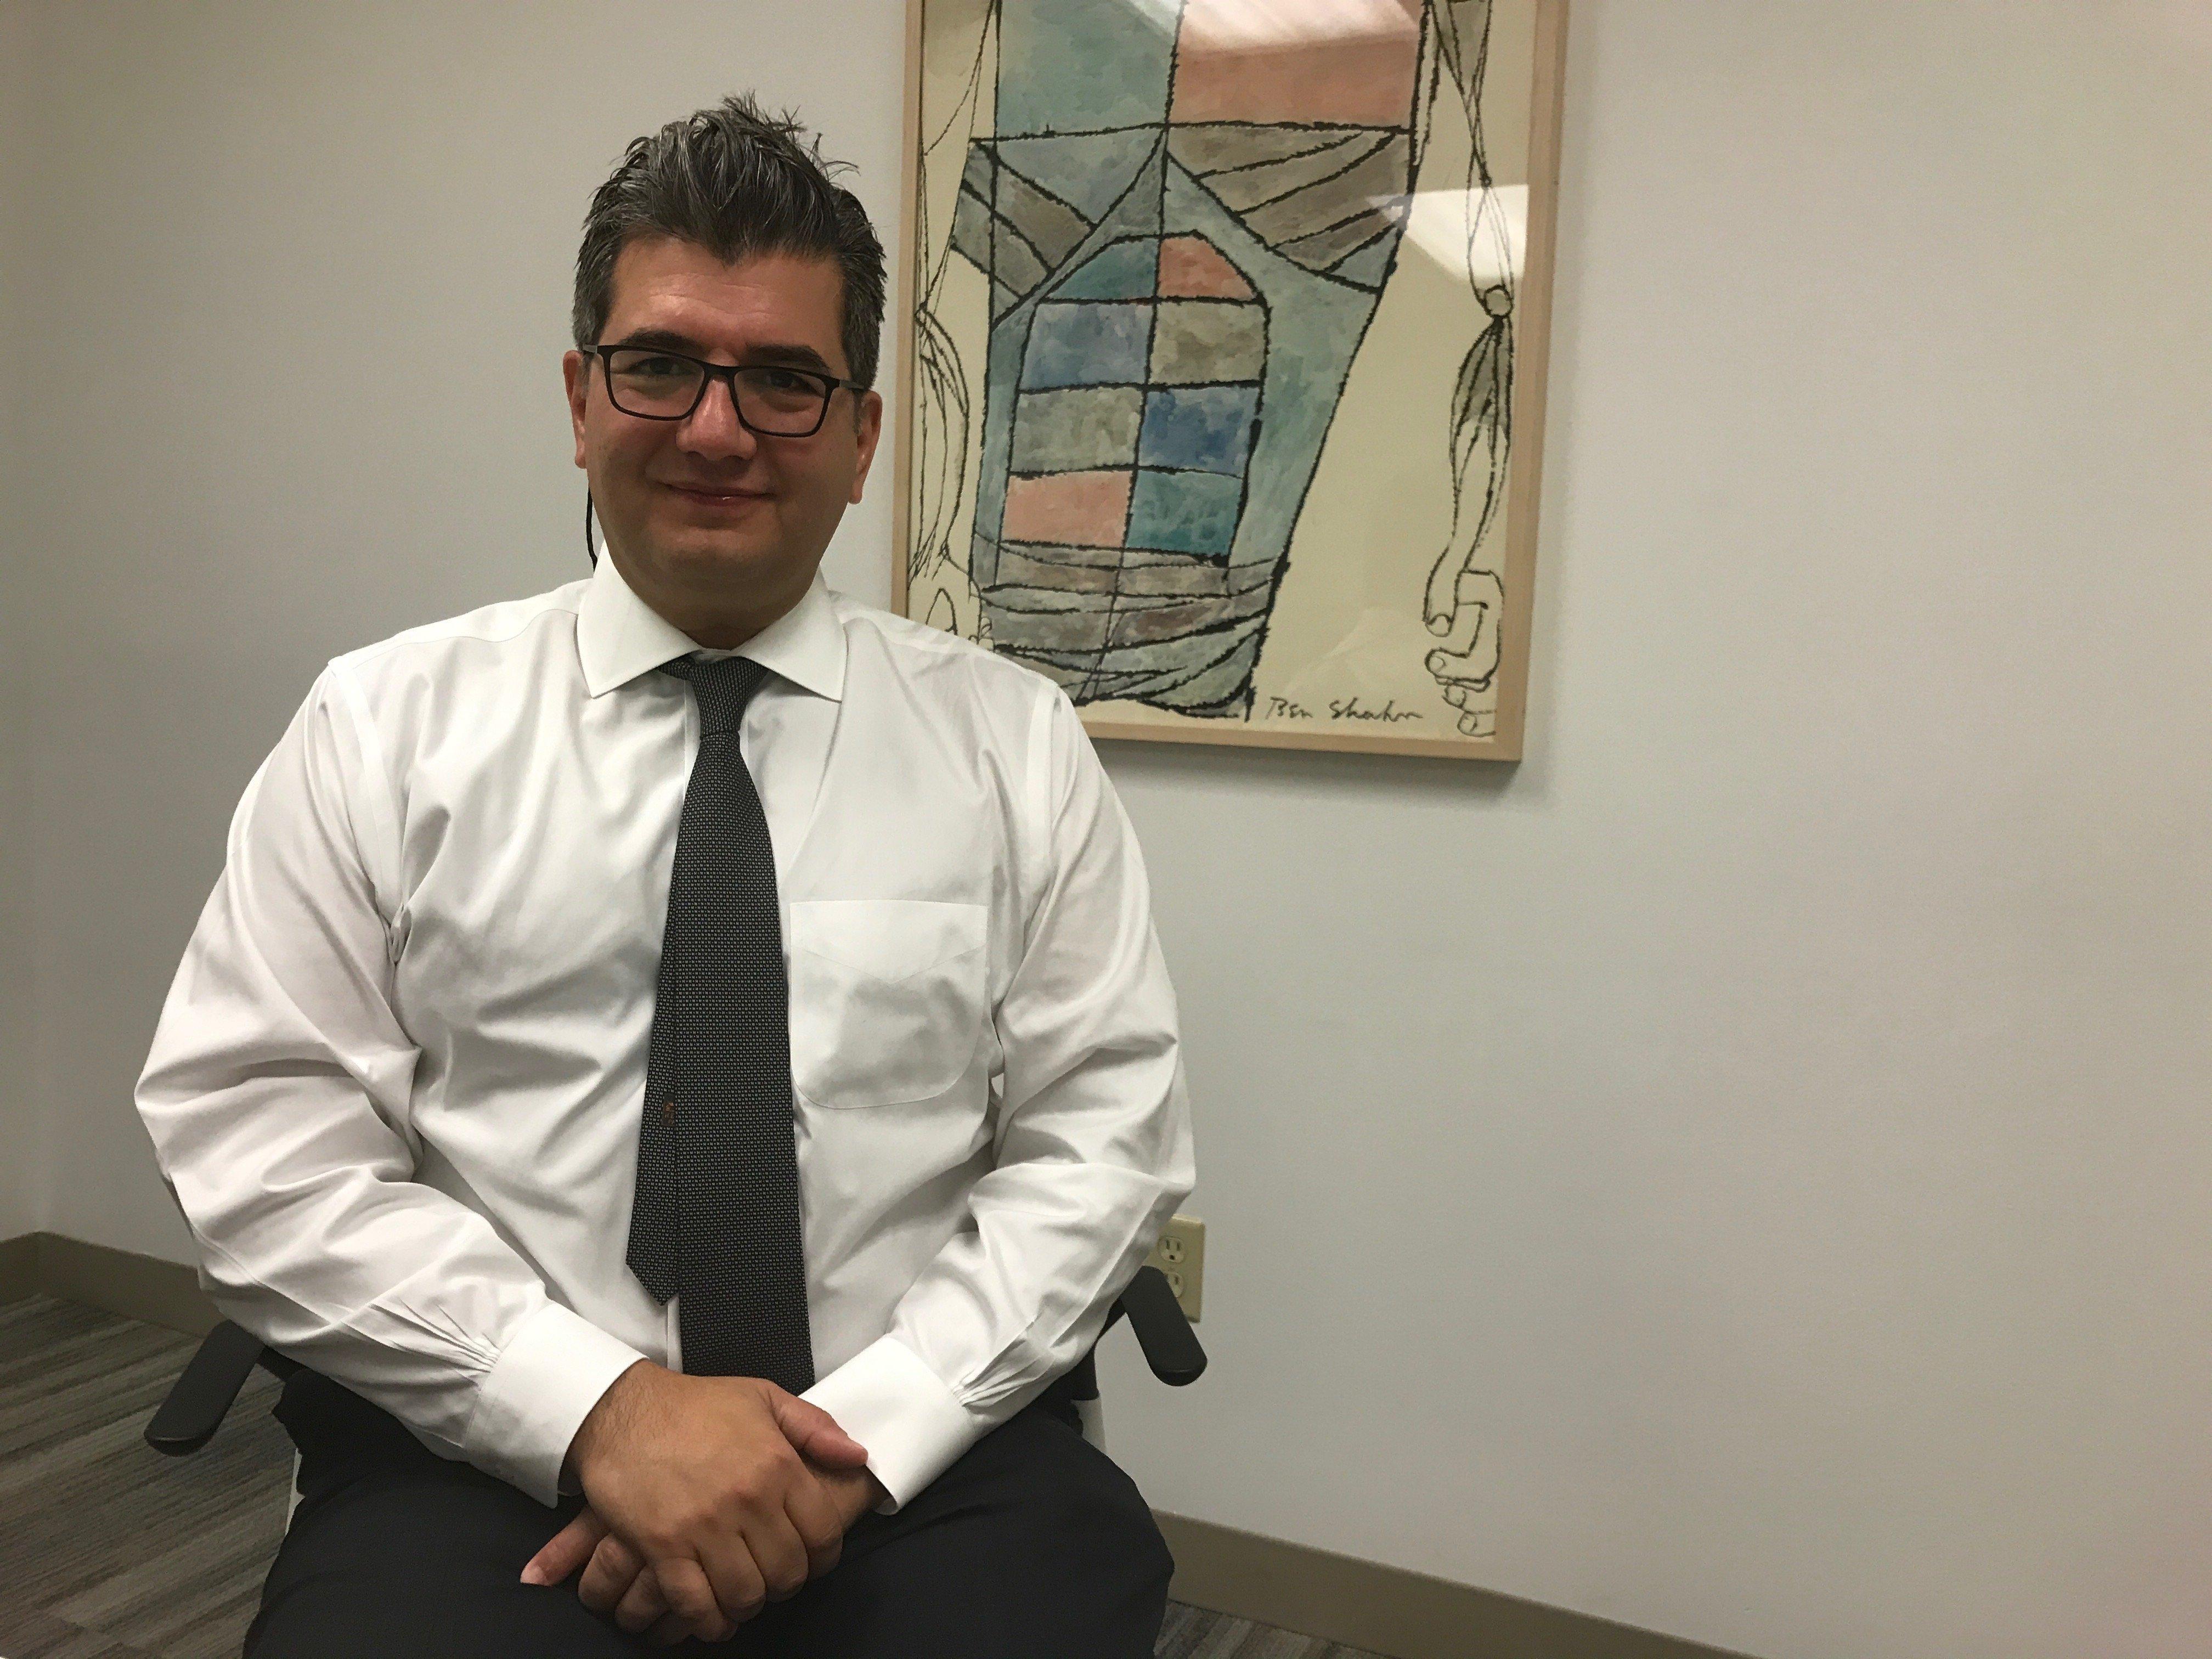 Dr. Maurice Garcia established theTransgender Surgery and Health Program atCedars-Sinai Medical Center in Los Ang